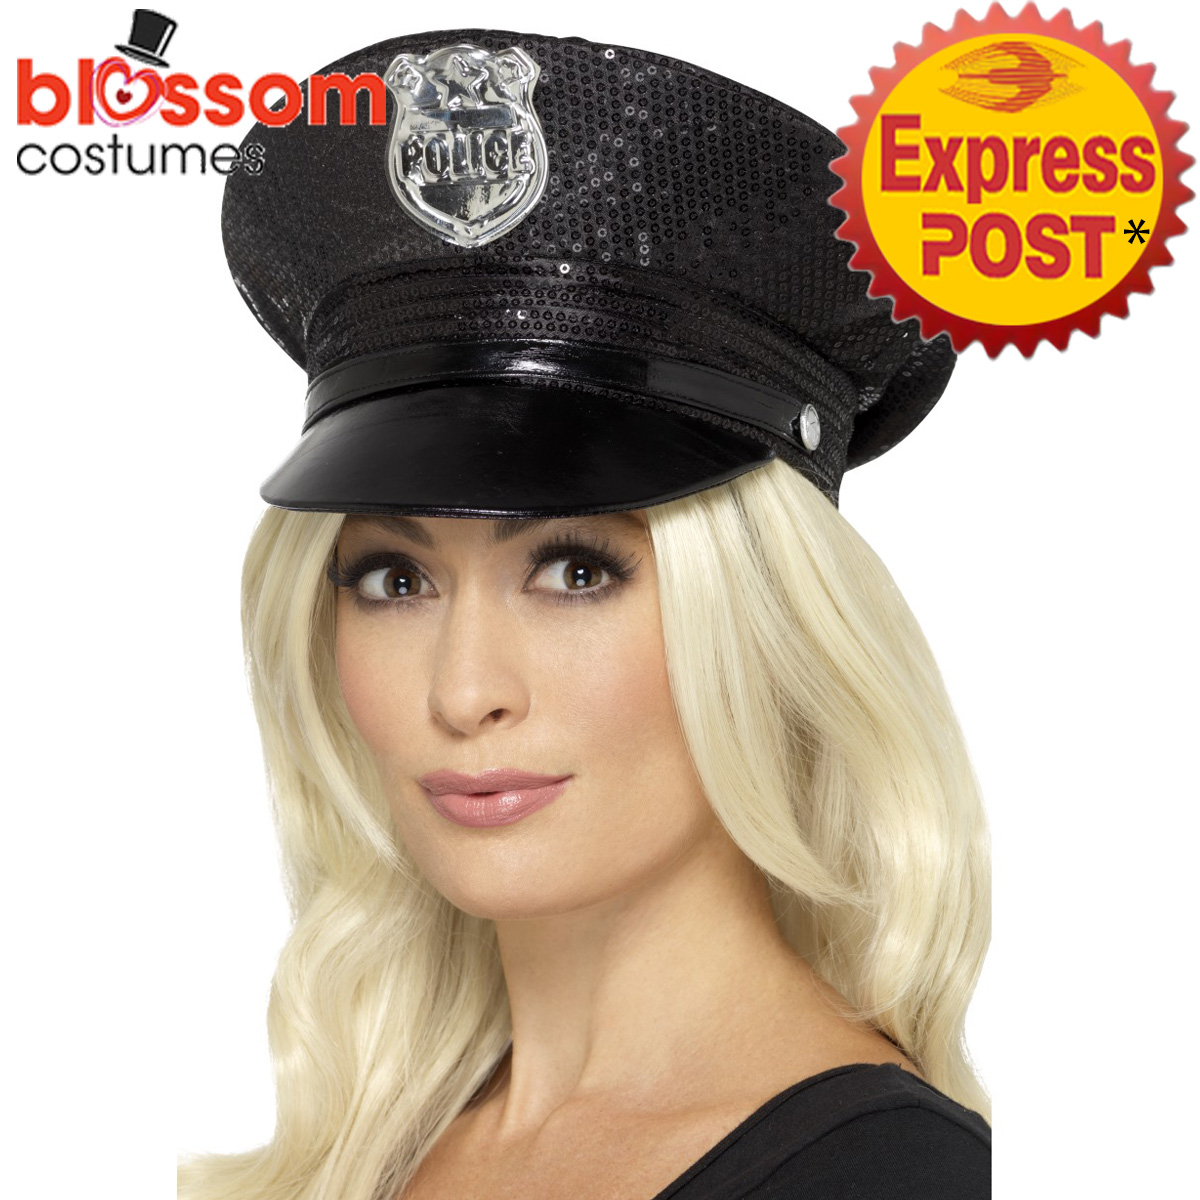 AC317-Fever-Sequin-Police-Hat-Black-Cops-amp-Robbers-Uniform-Costume-Accessory